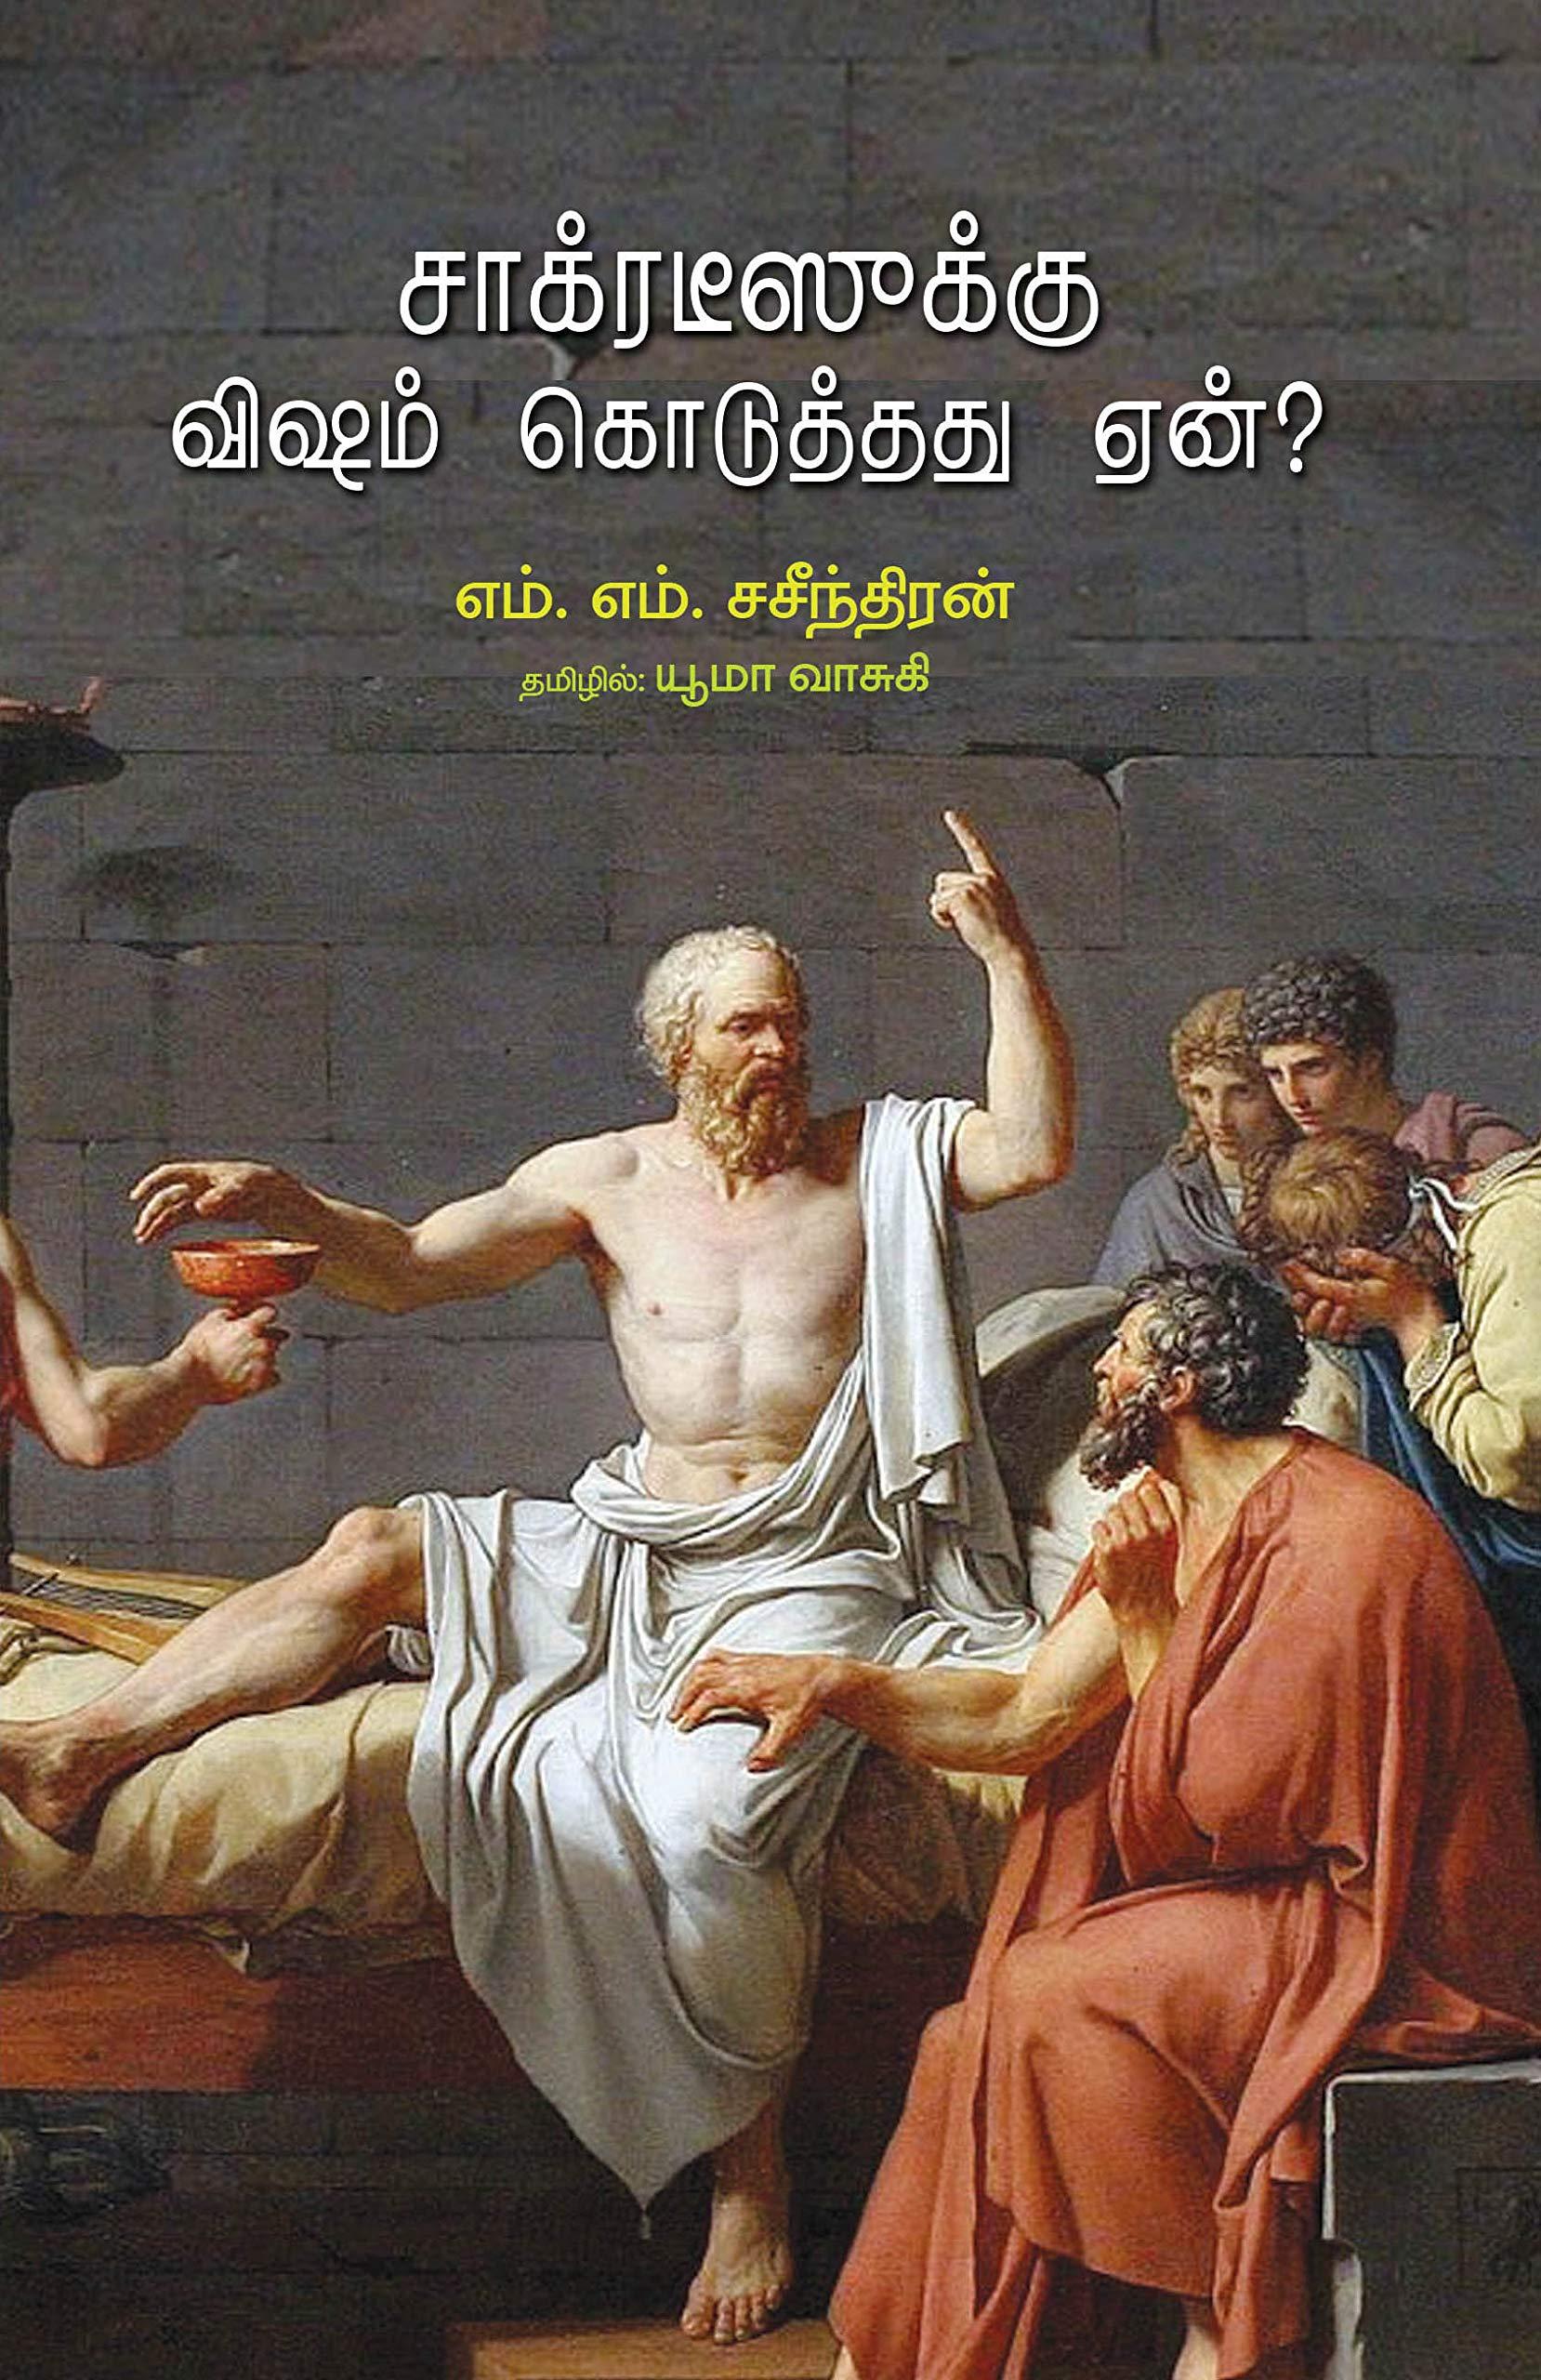 Buy Socratesku visham koduthathu Yean - சாக்ரடிஸூக்கு ...